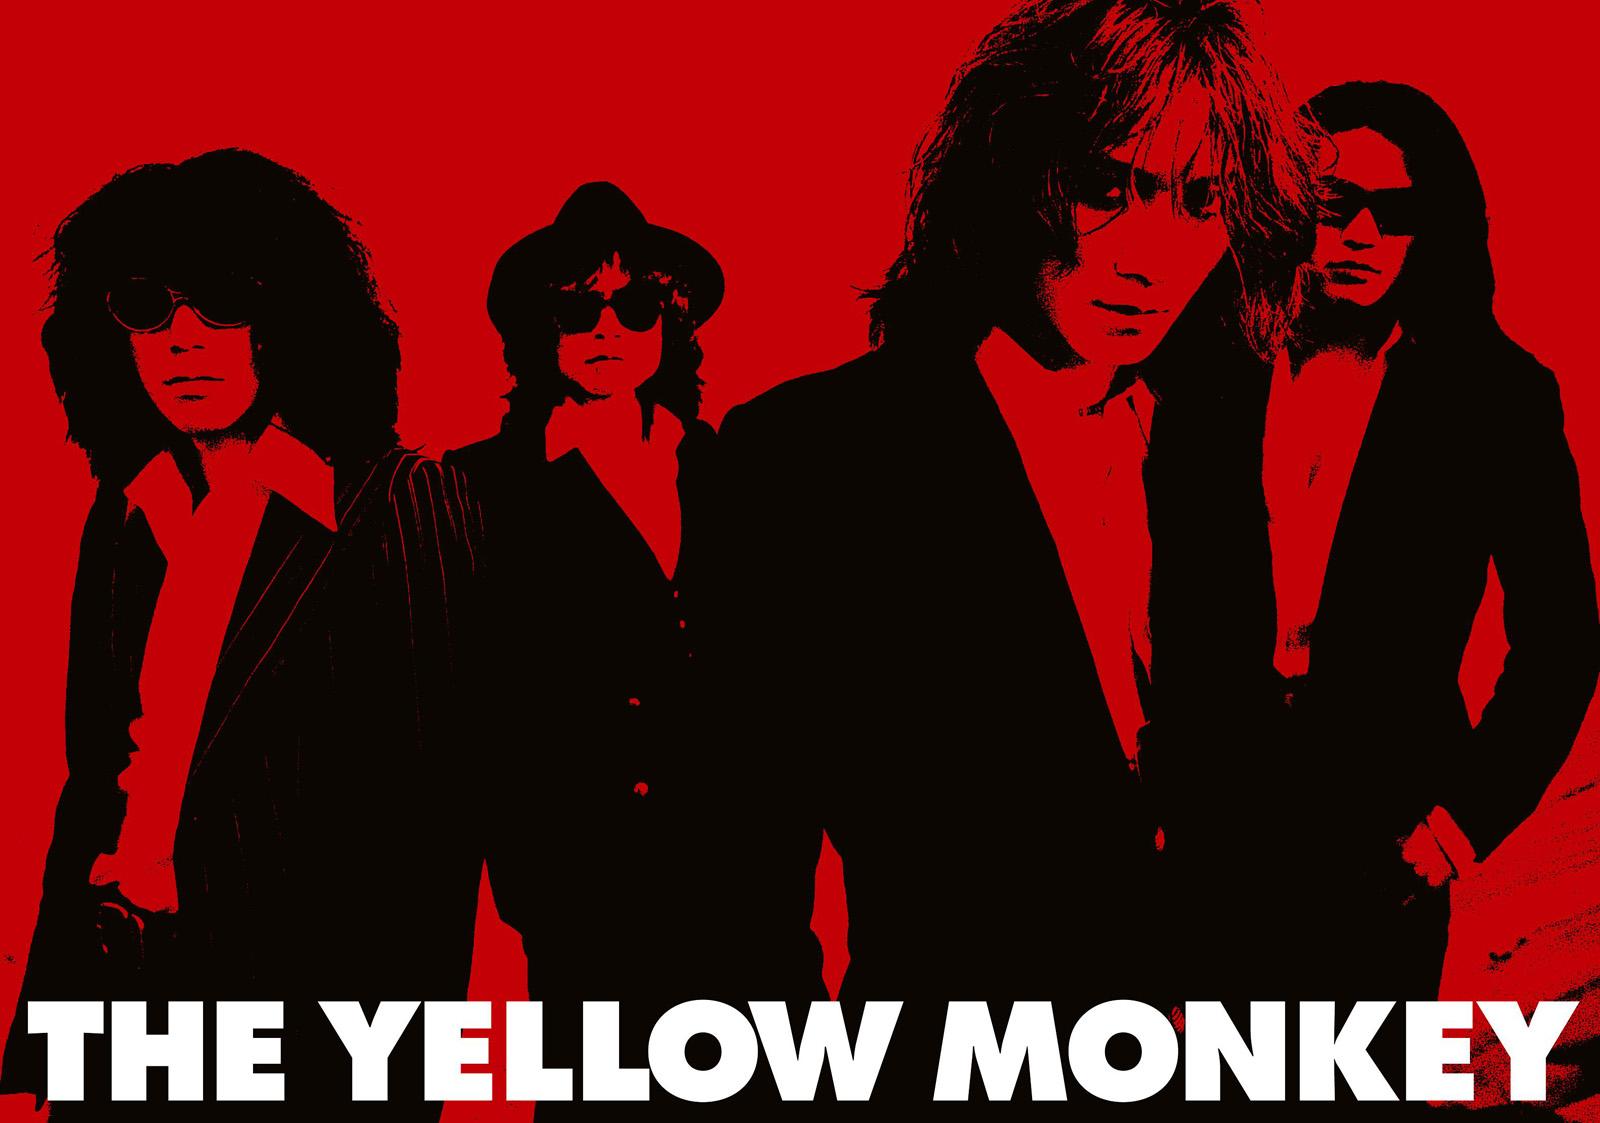 The Yellow Monkey 11月23日より開催 タワモン 会場写真公開 Rockの総合情報サイトvif